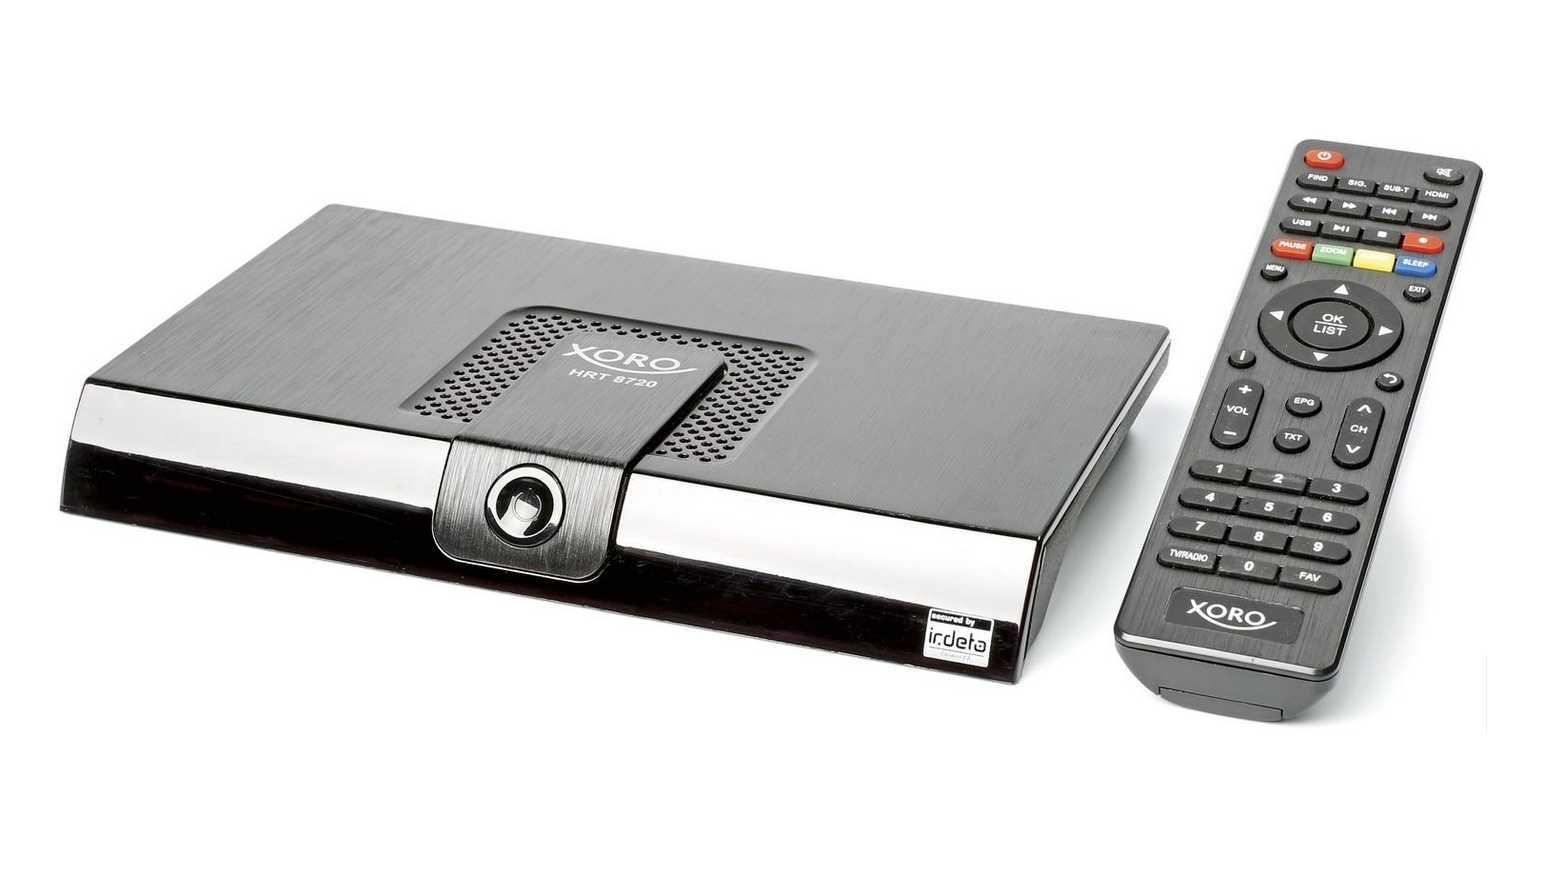 Full-HD-Receiver für DVB-T2 HD: ab 40 Euro und gut verfügbar